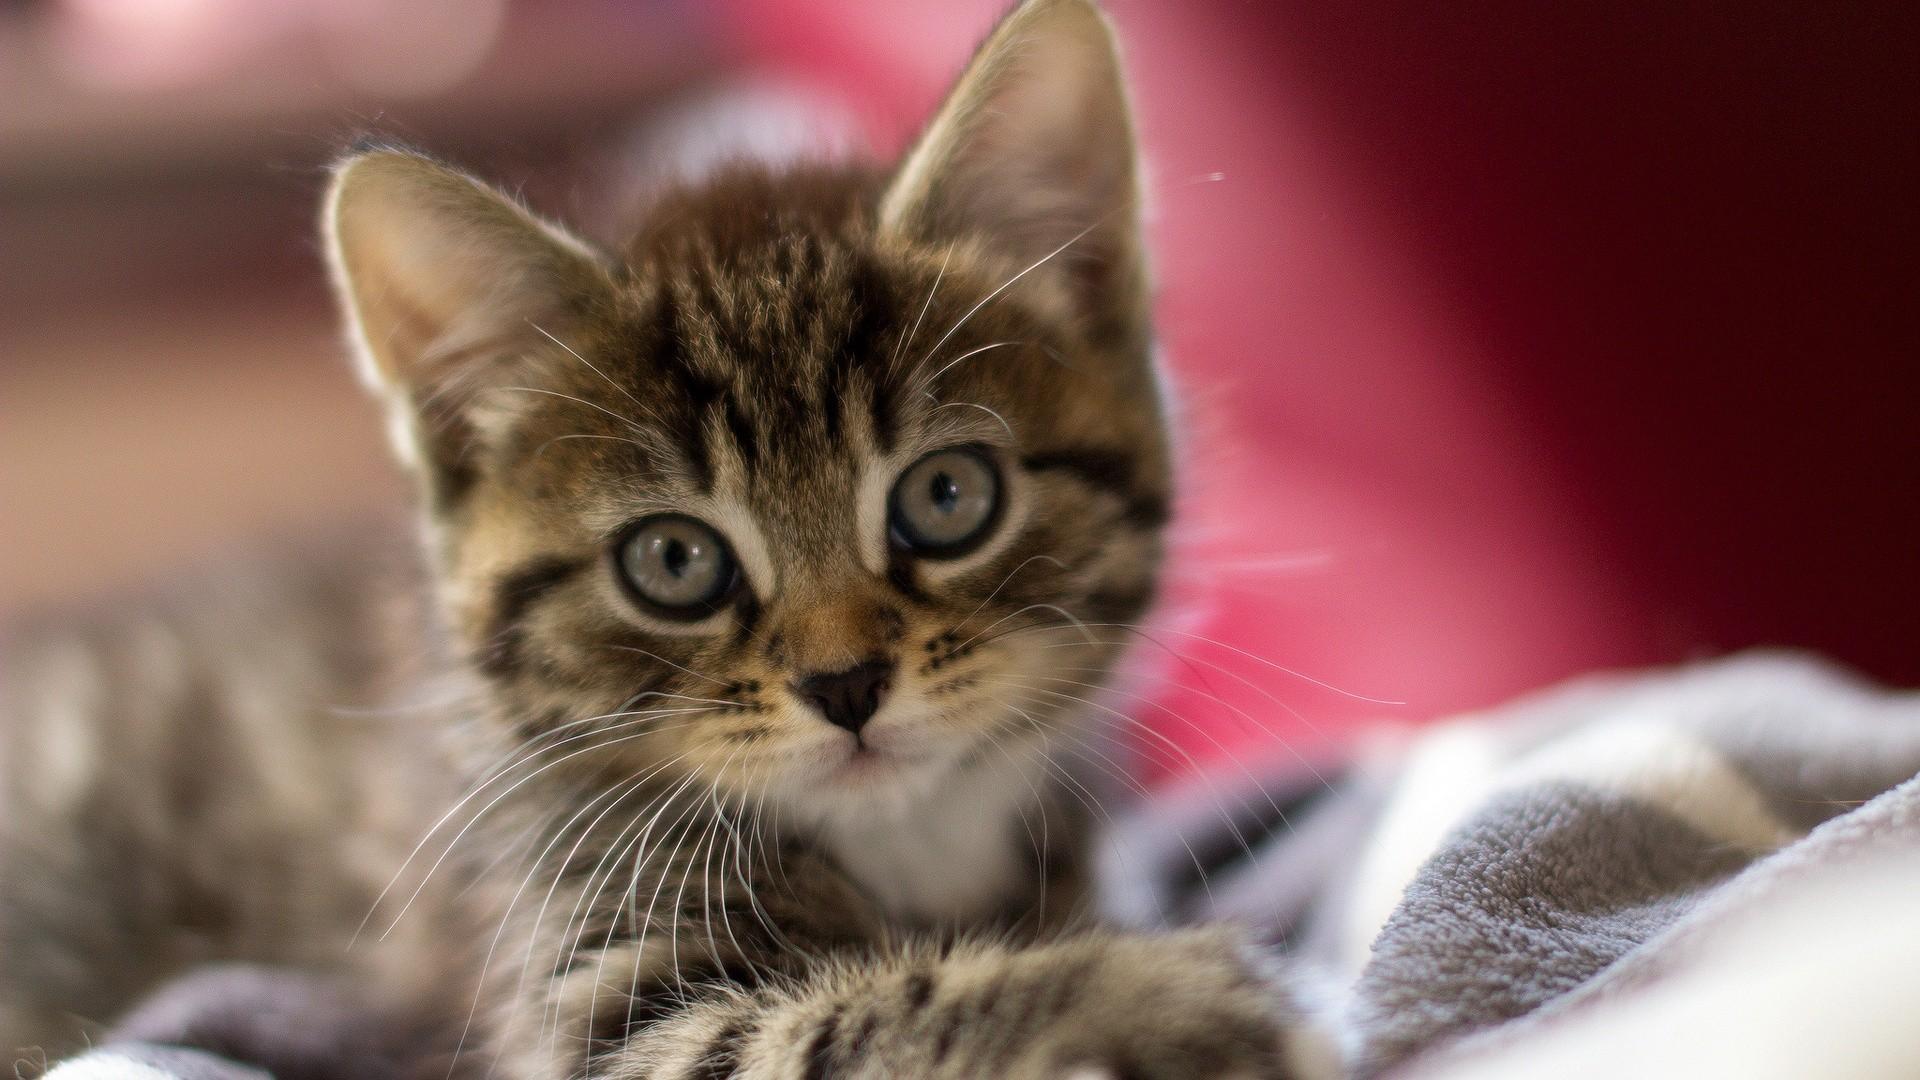 Very Cute Baby Mobile Wallpaper Baby Kitten Wallpaper 183 ① Wallpapertag